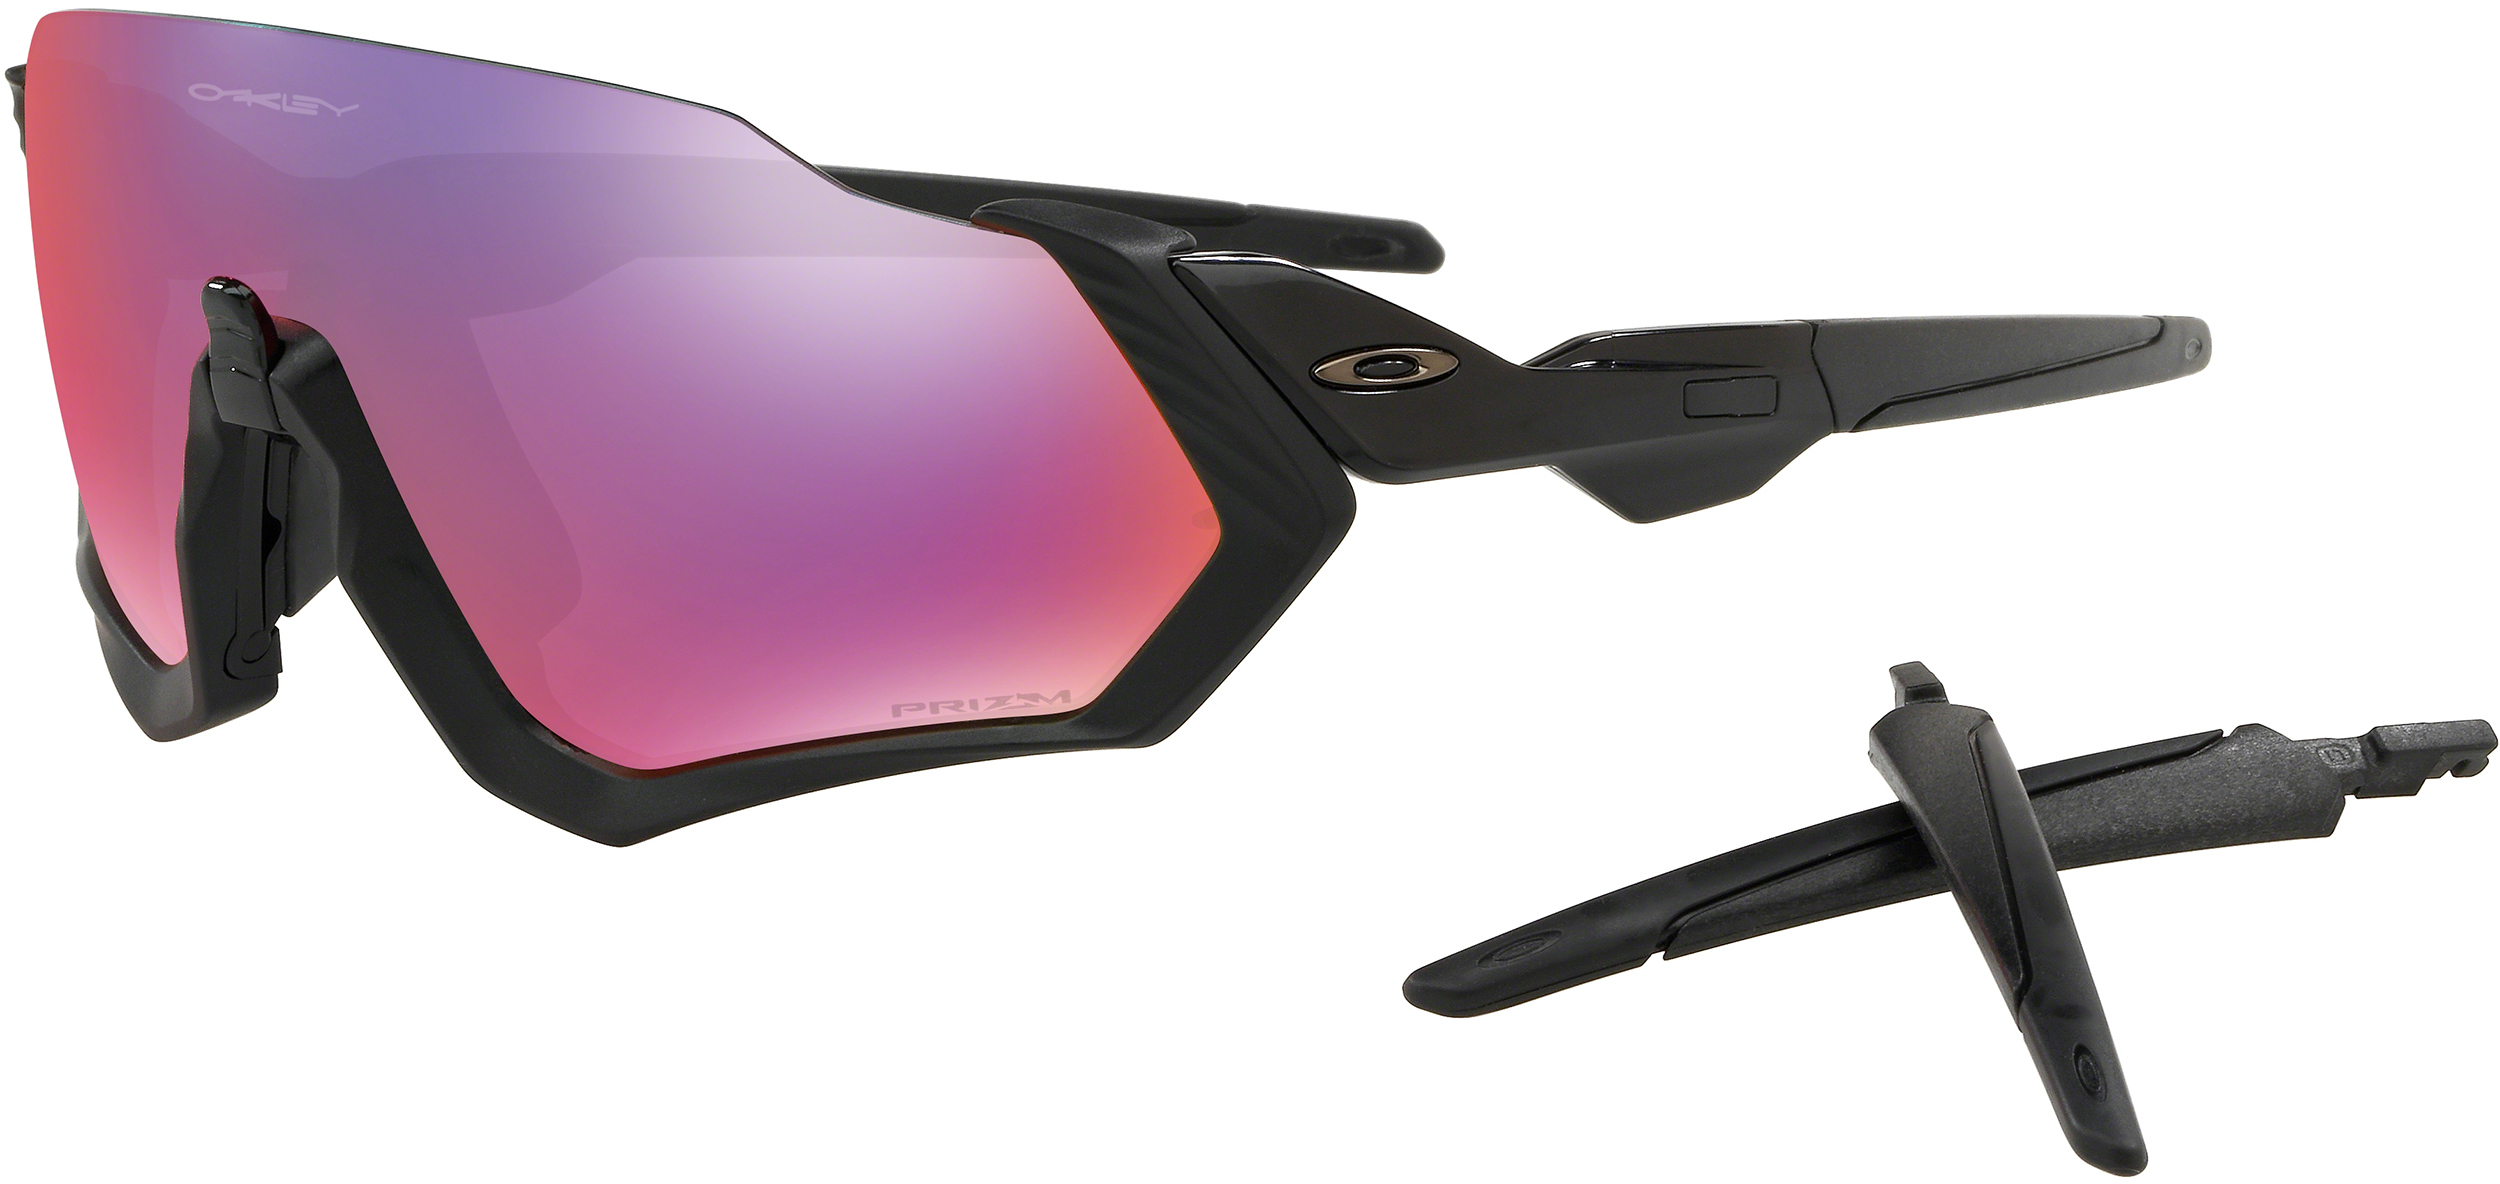 7c31d7650 Oakley Flight Jacket Sunglasses - Unisex